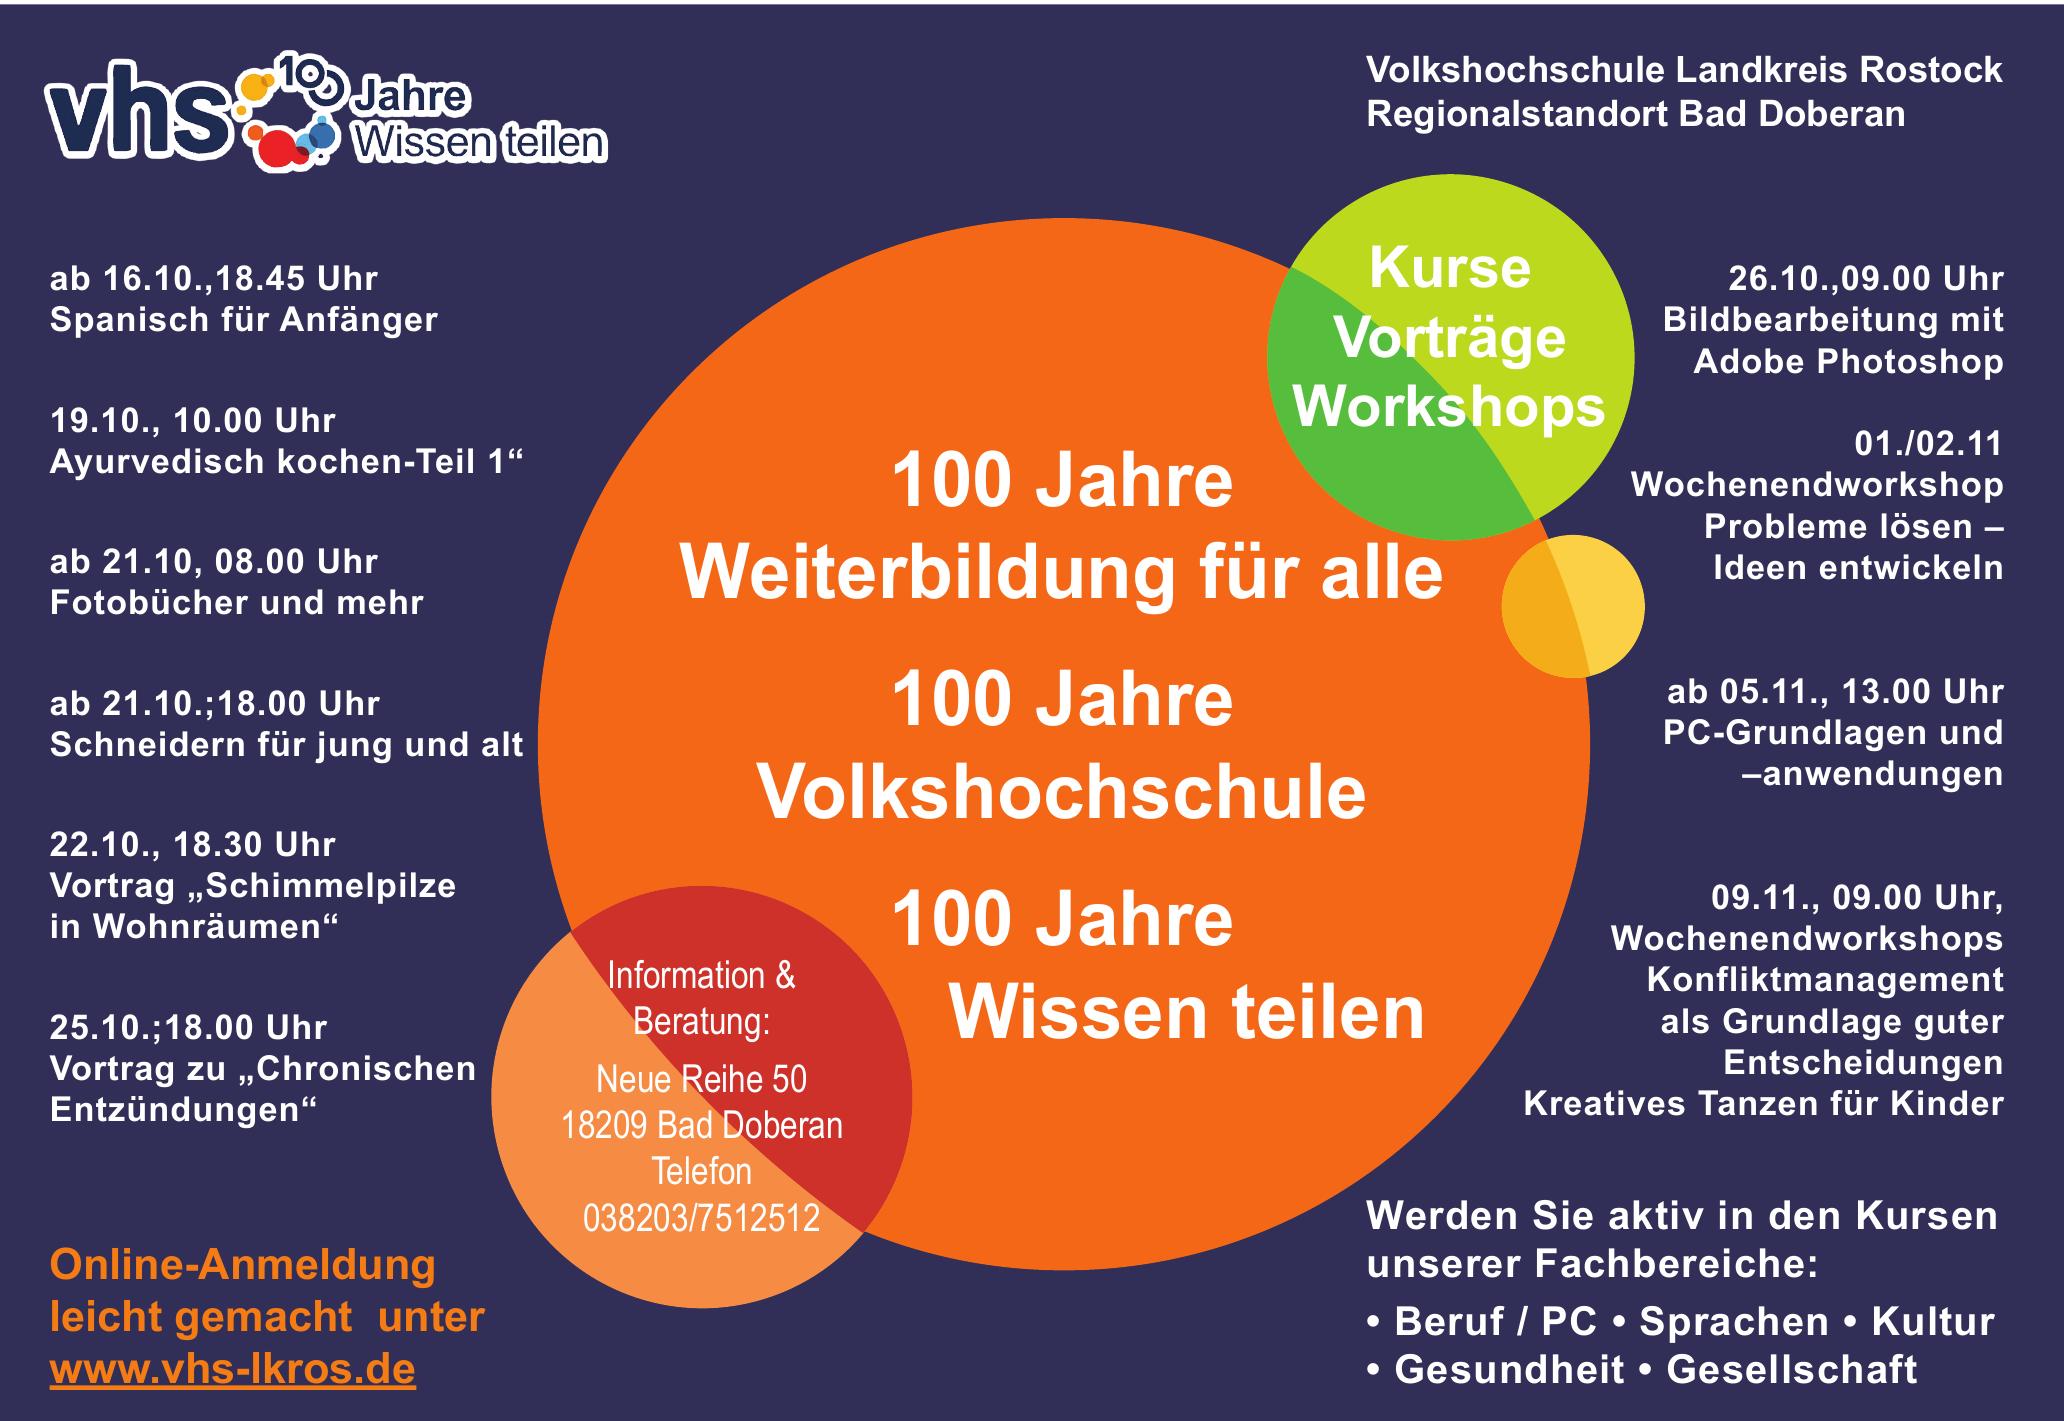 Volkshochschule des Landkreises Rostock-Regionalstandort Bad Doberan